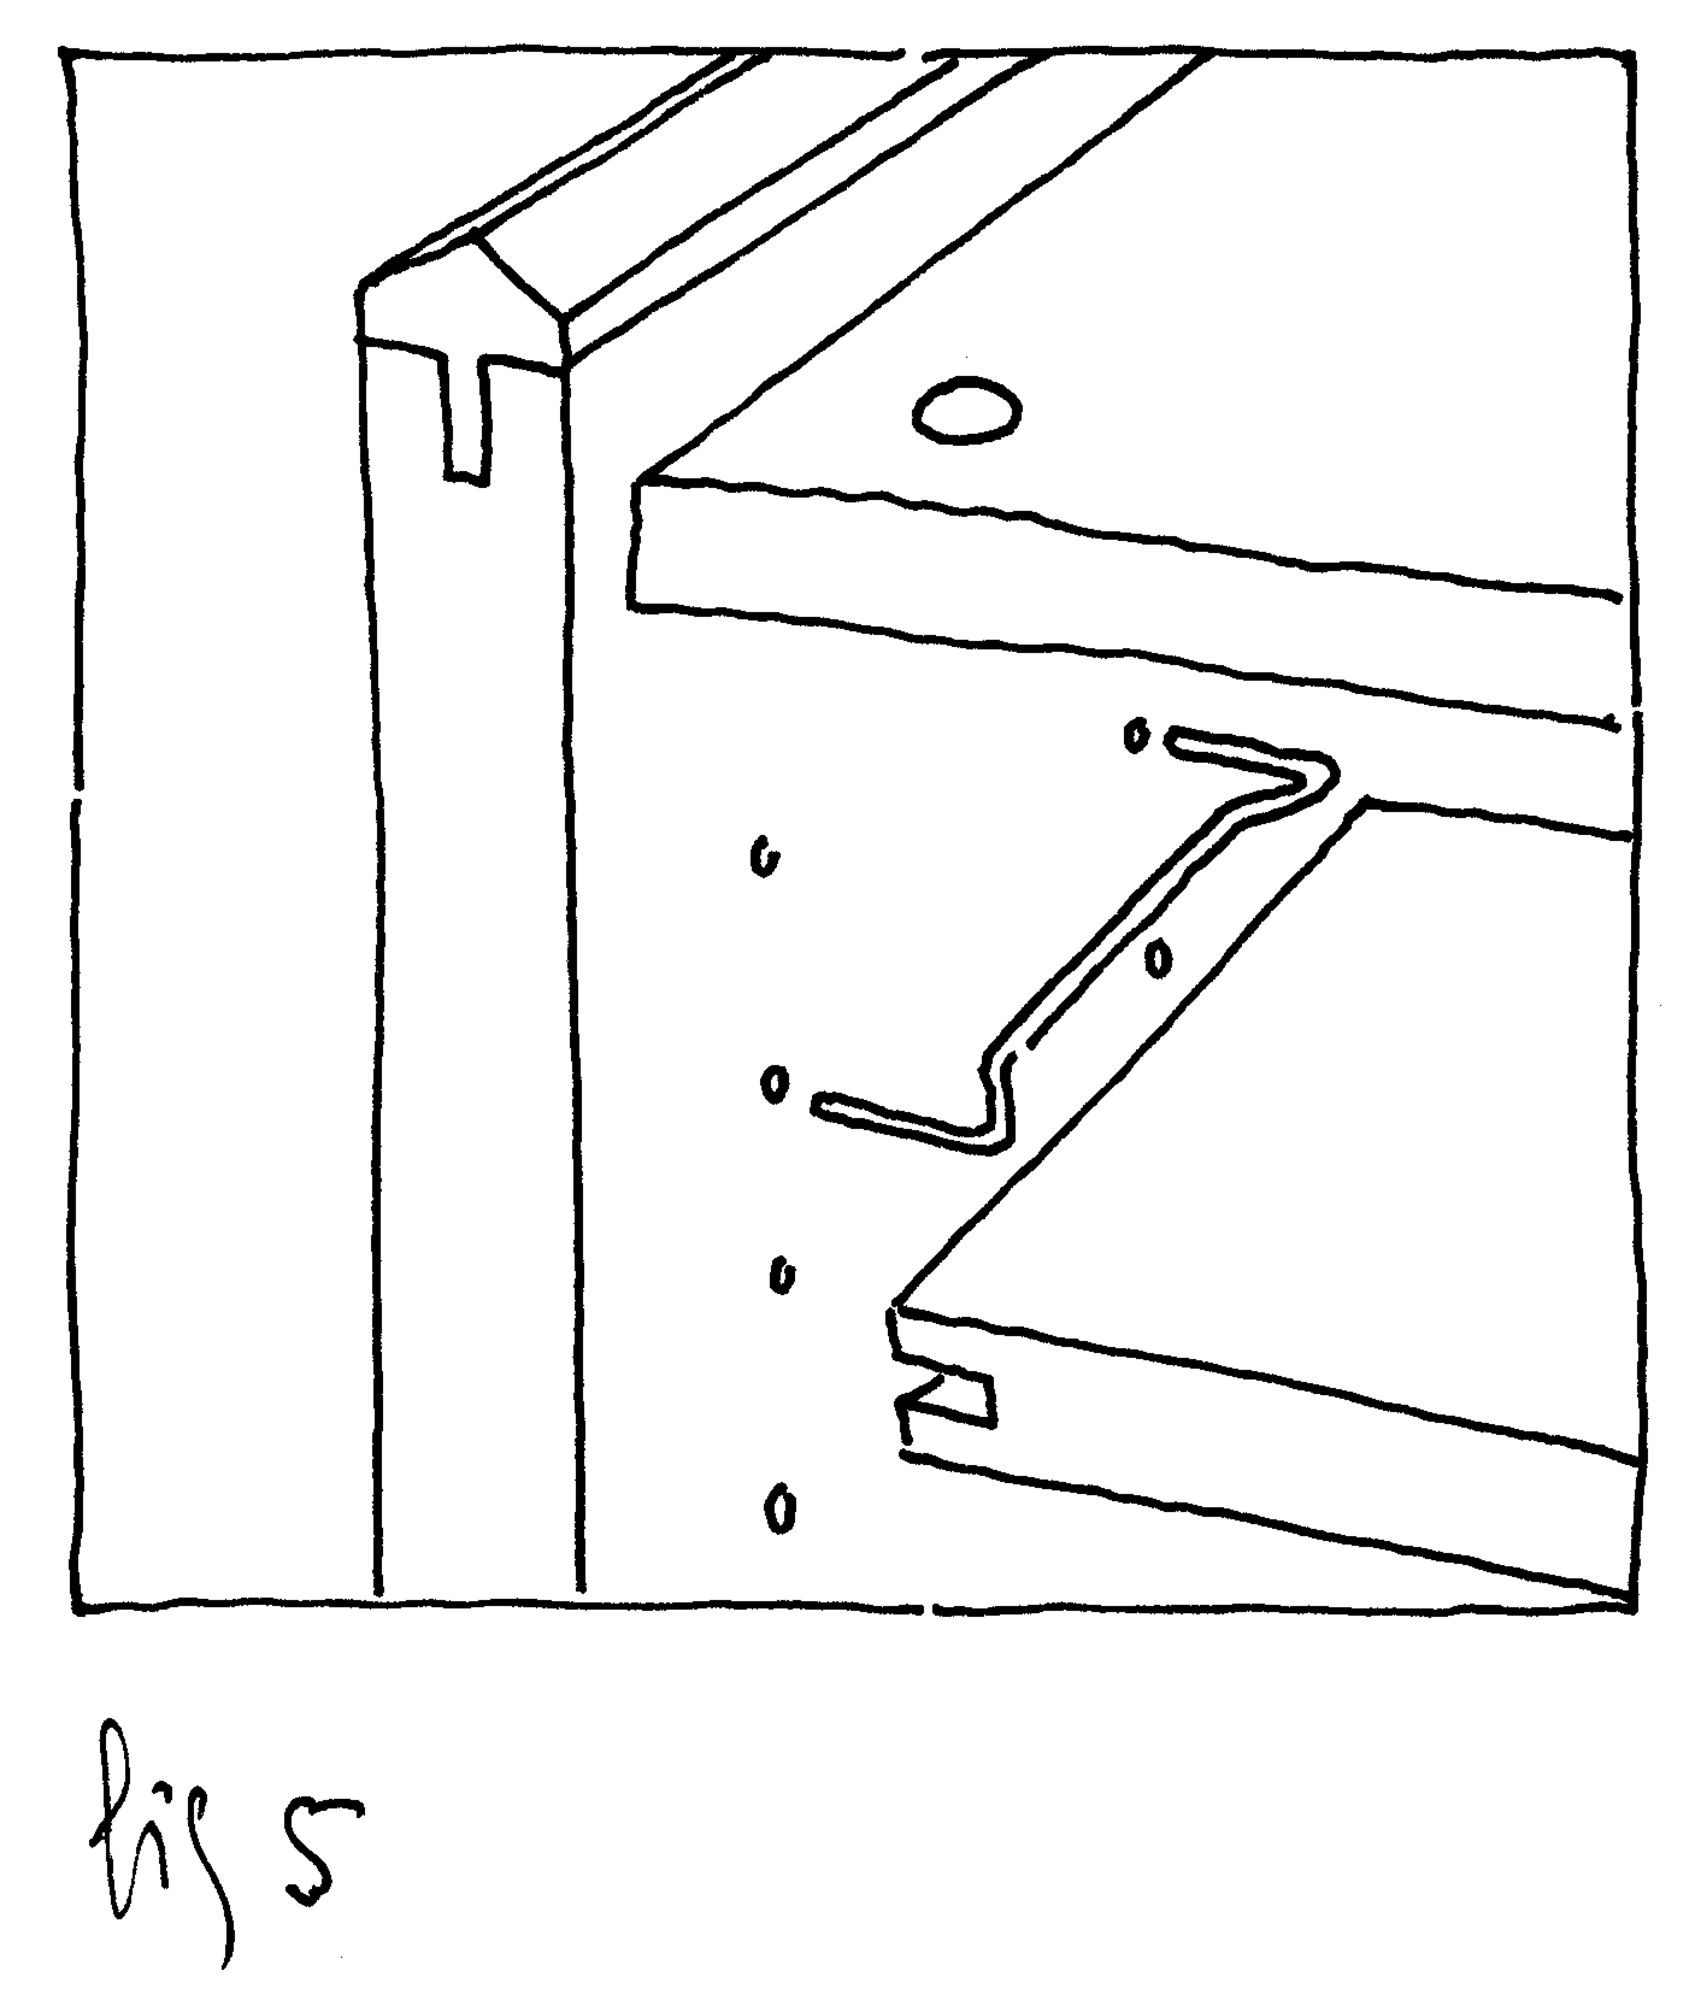 Decoplan meubelen De Coene 06